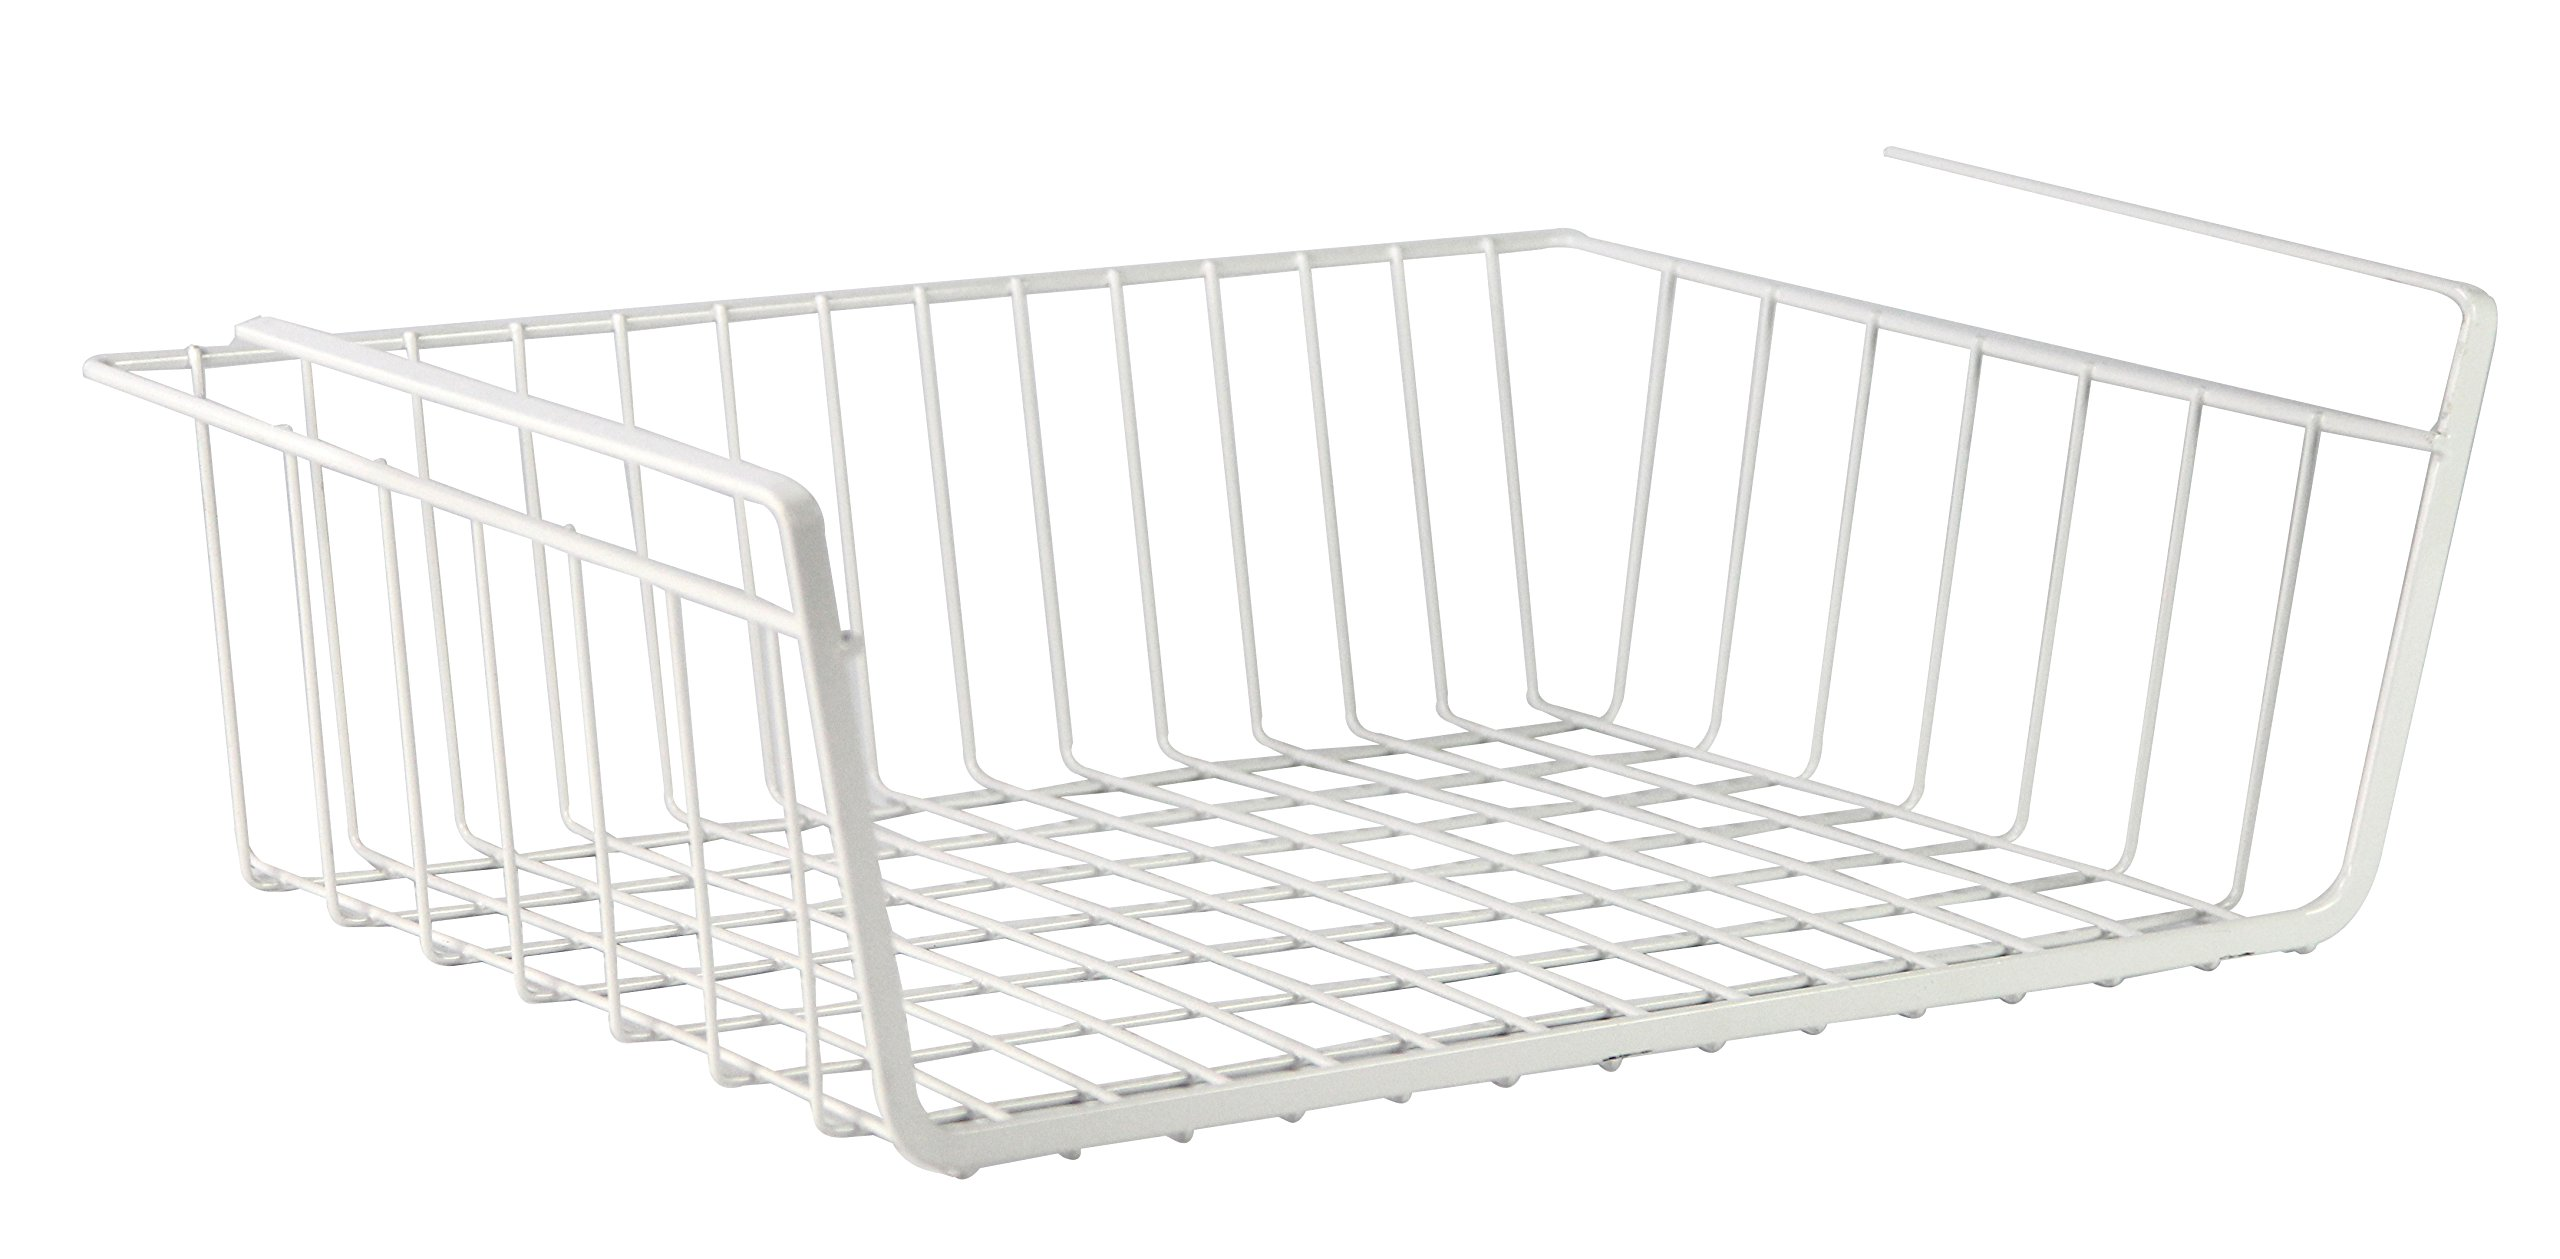 PAO MOTORING Under Shelf Storage Basket, 40 cm - White,Pack of 2